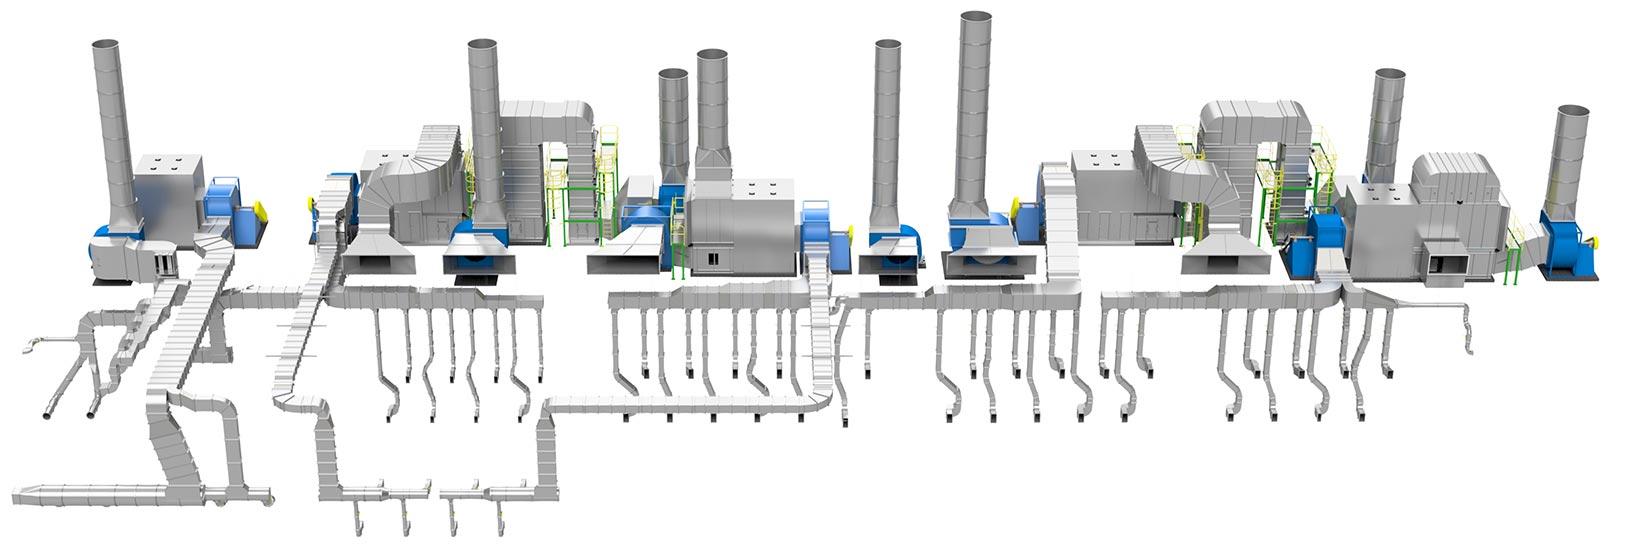 Process Air Systems Main Purposes